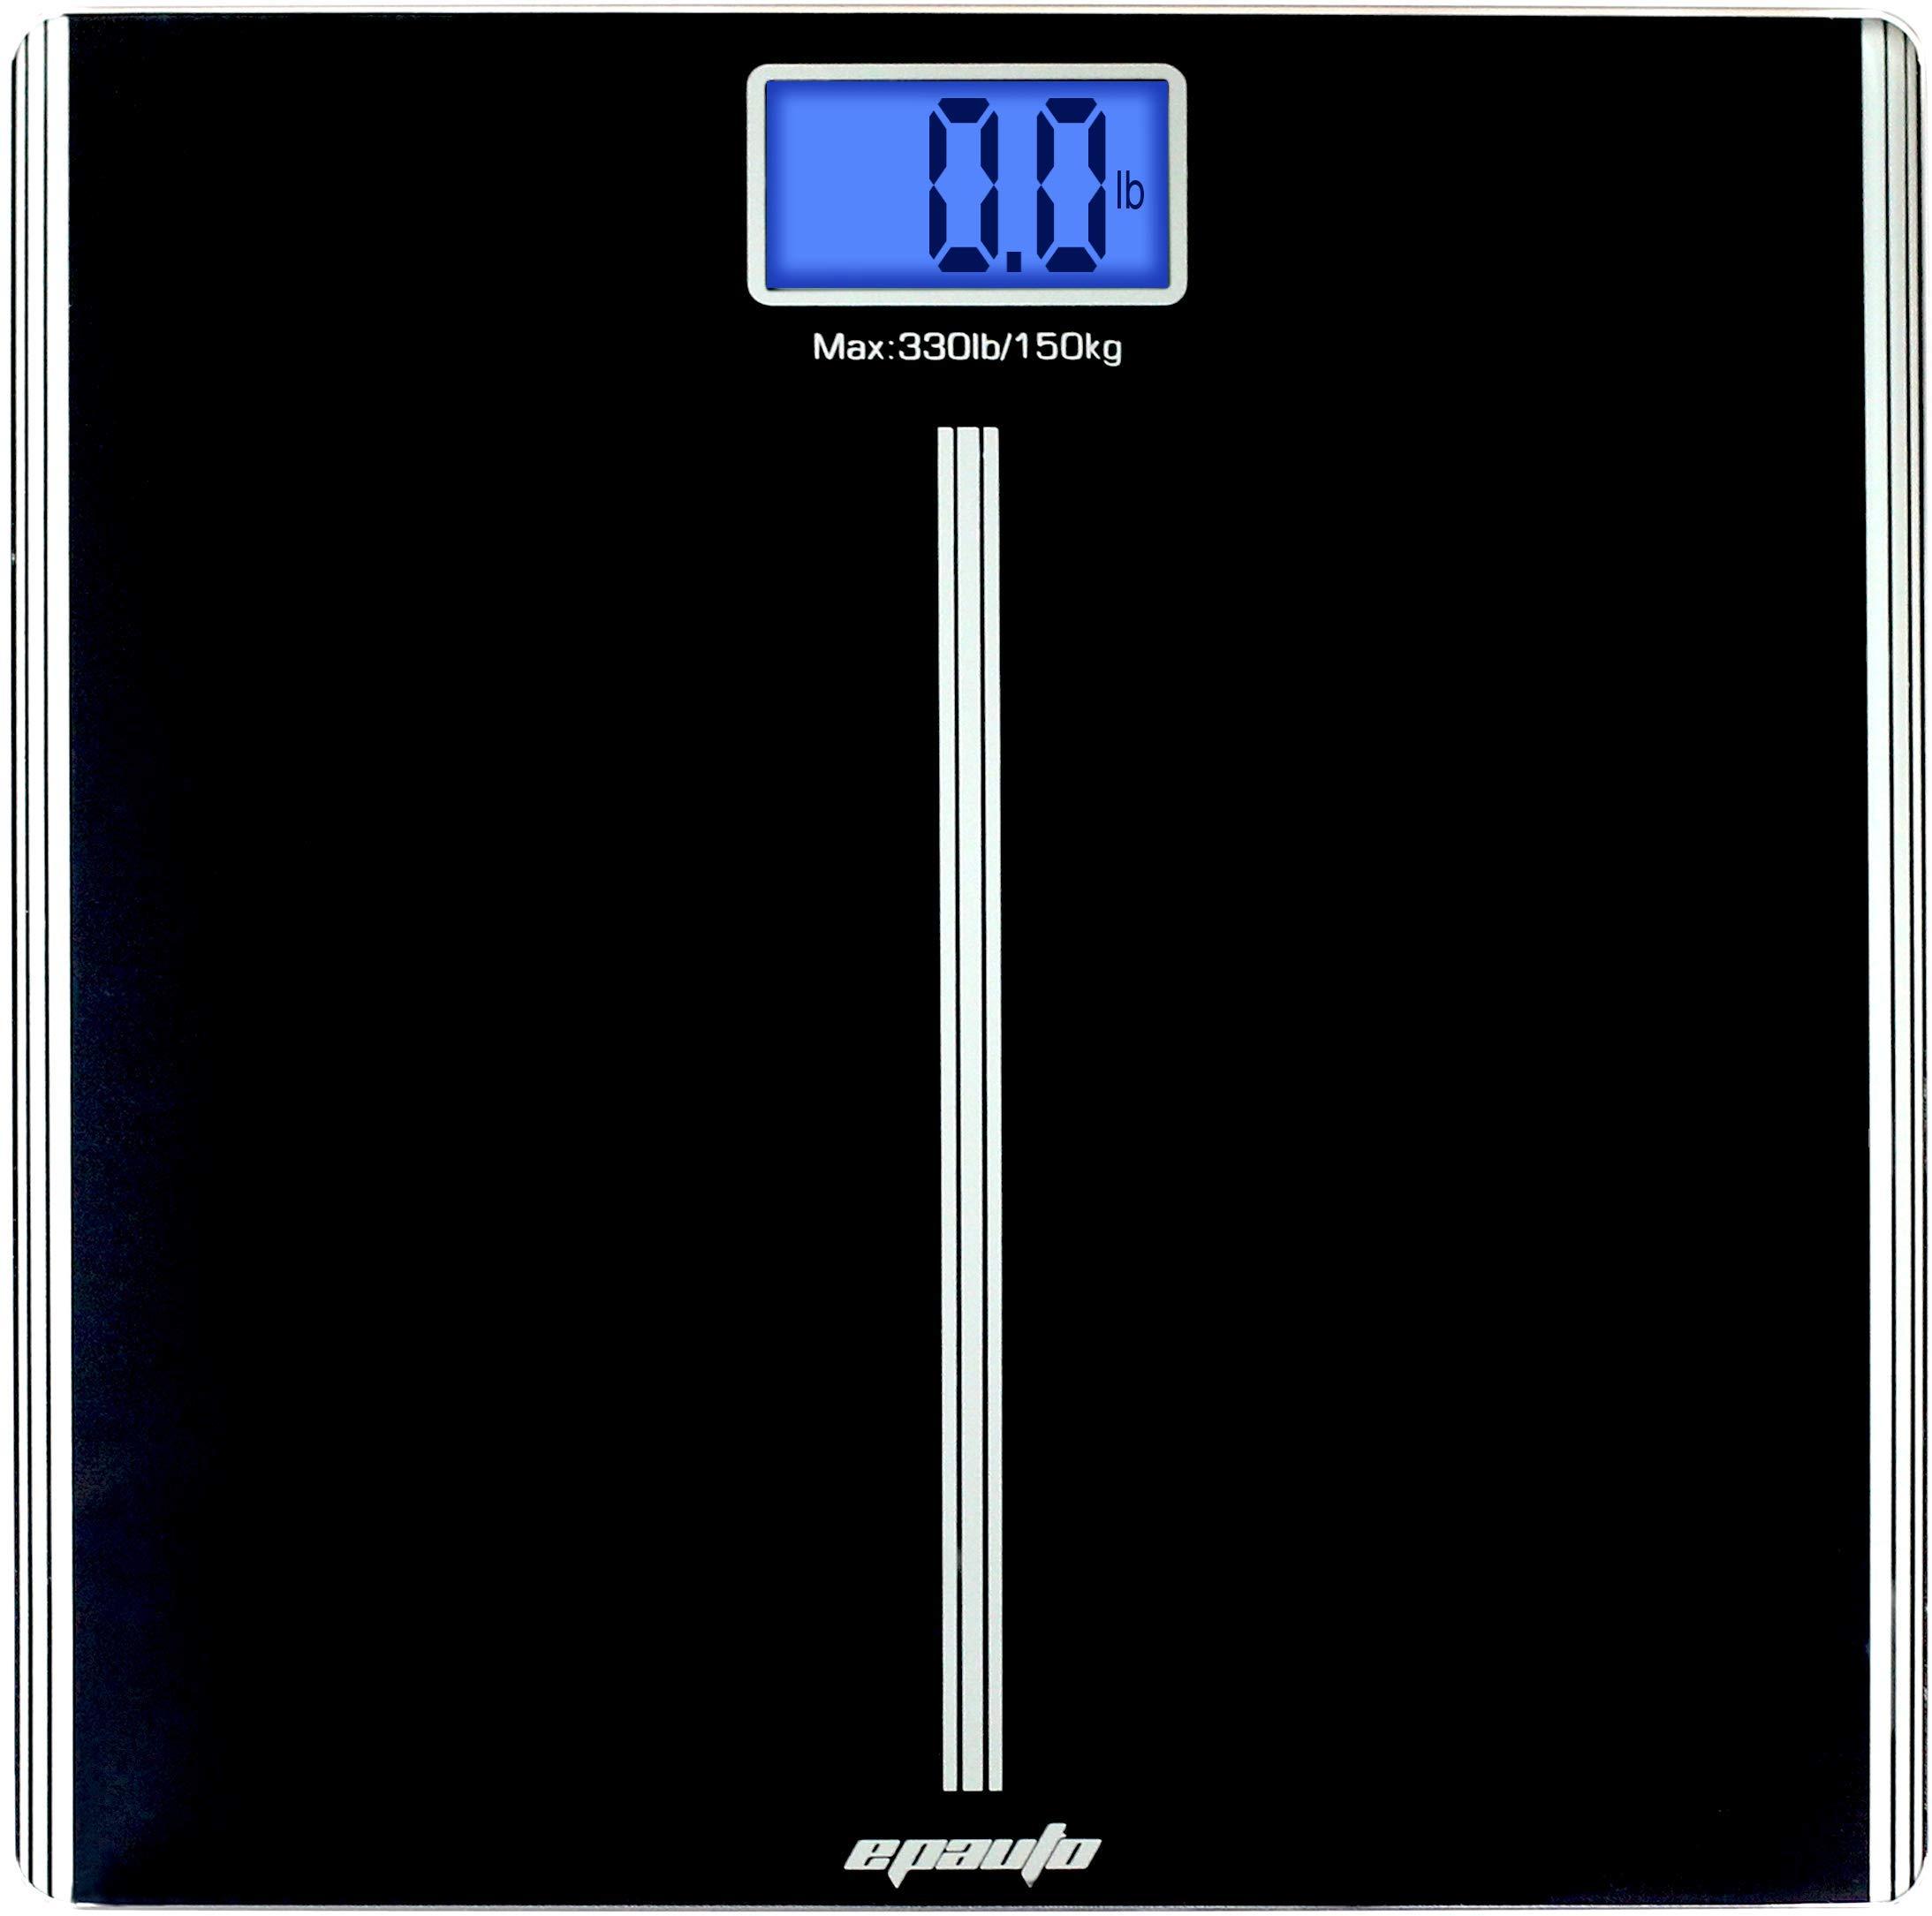 EPAuto Precision Digital Bathroom Body Weight Scale, Black by EPAuto